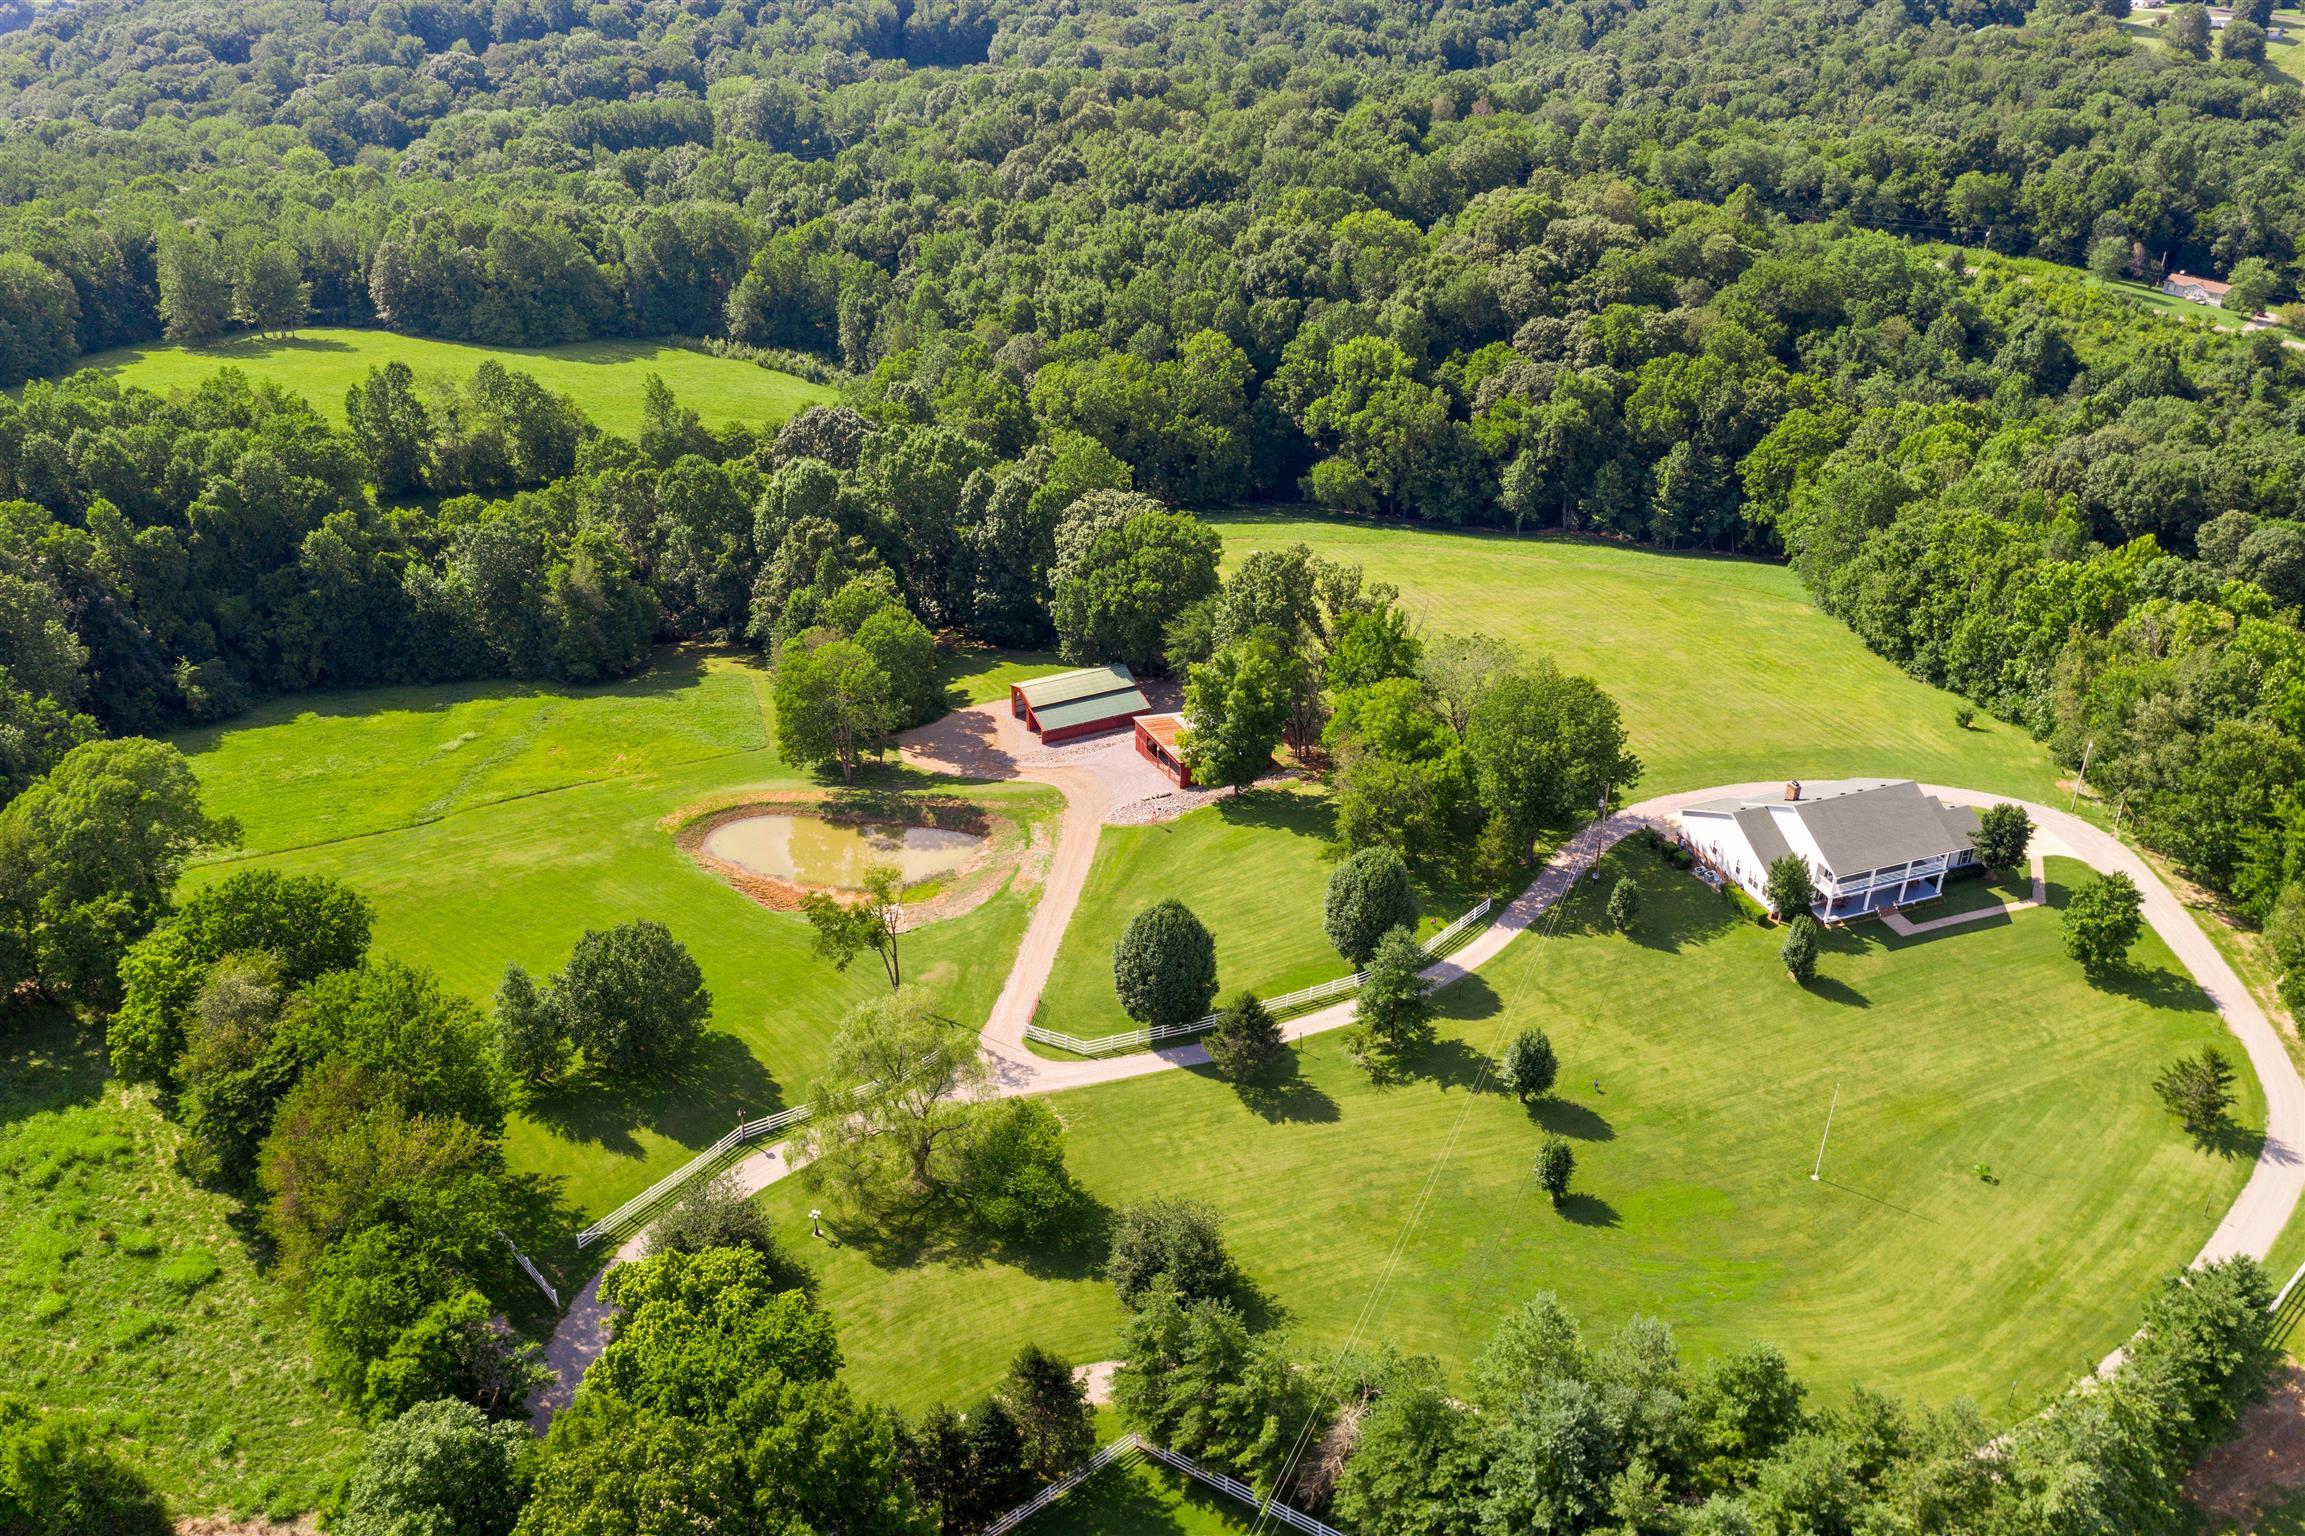 176 Deerview Ln, Clarksville, TN 37043 - Clarksville, TN real estate listing